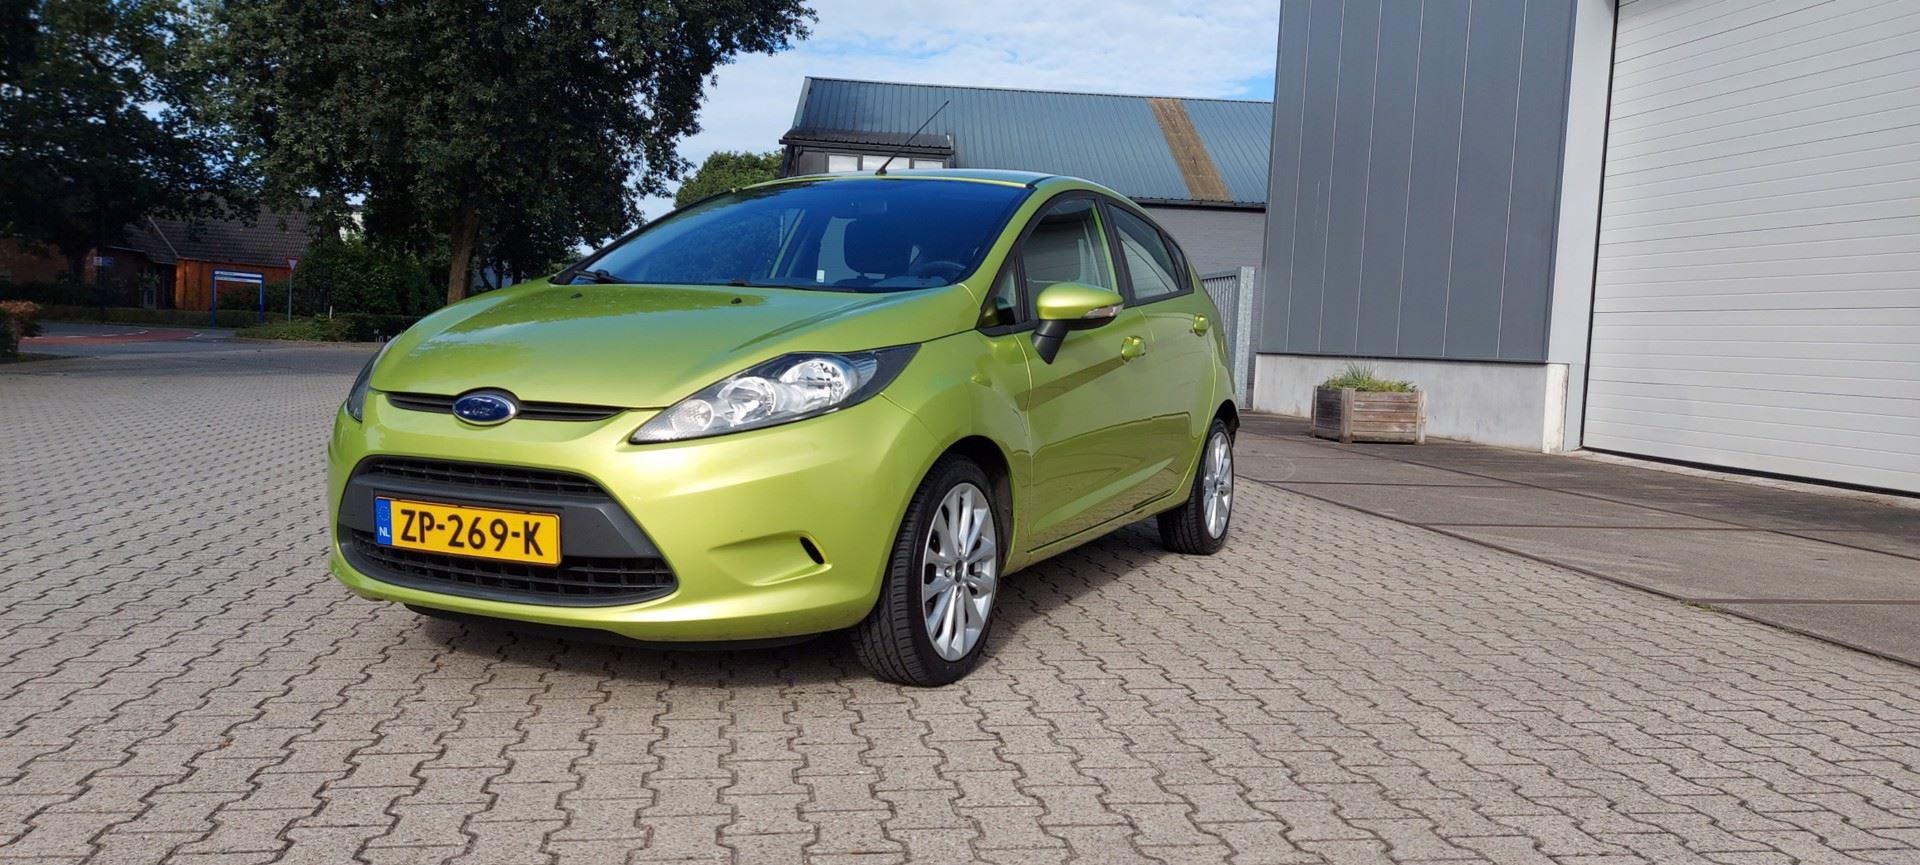 Ford Fiesta occasion - H. Kok Auto's